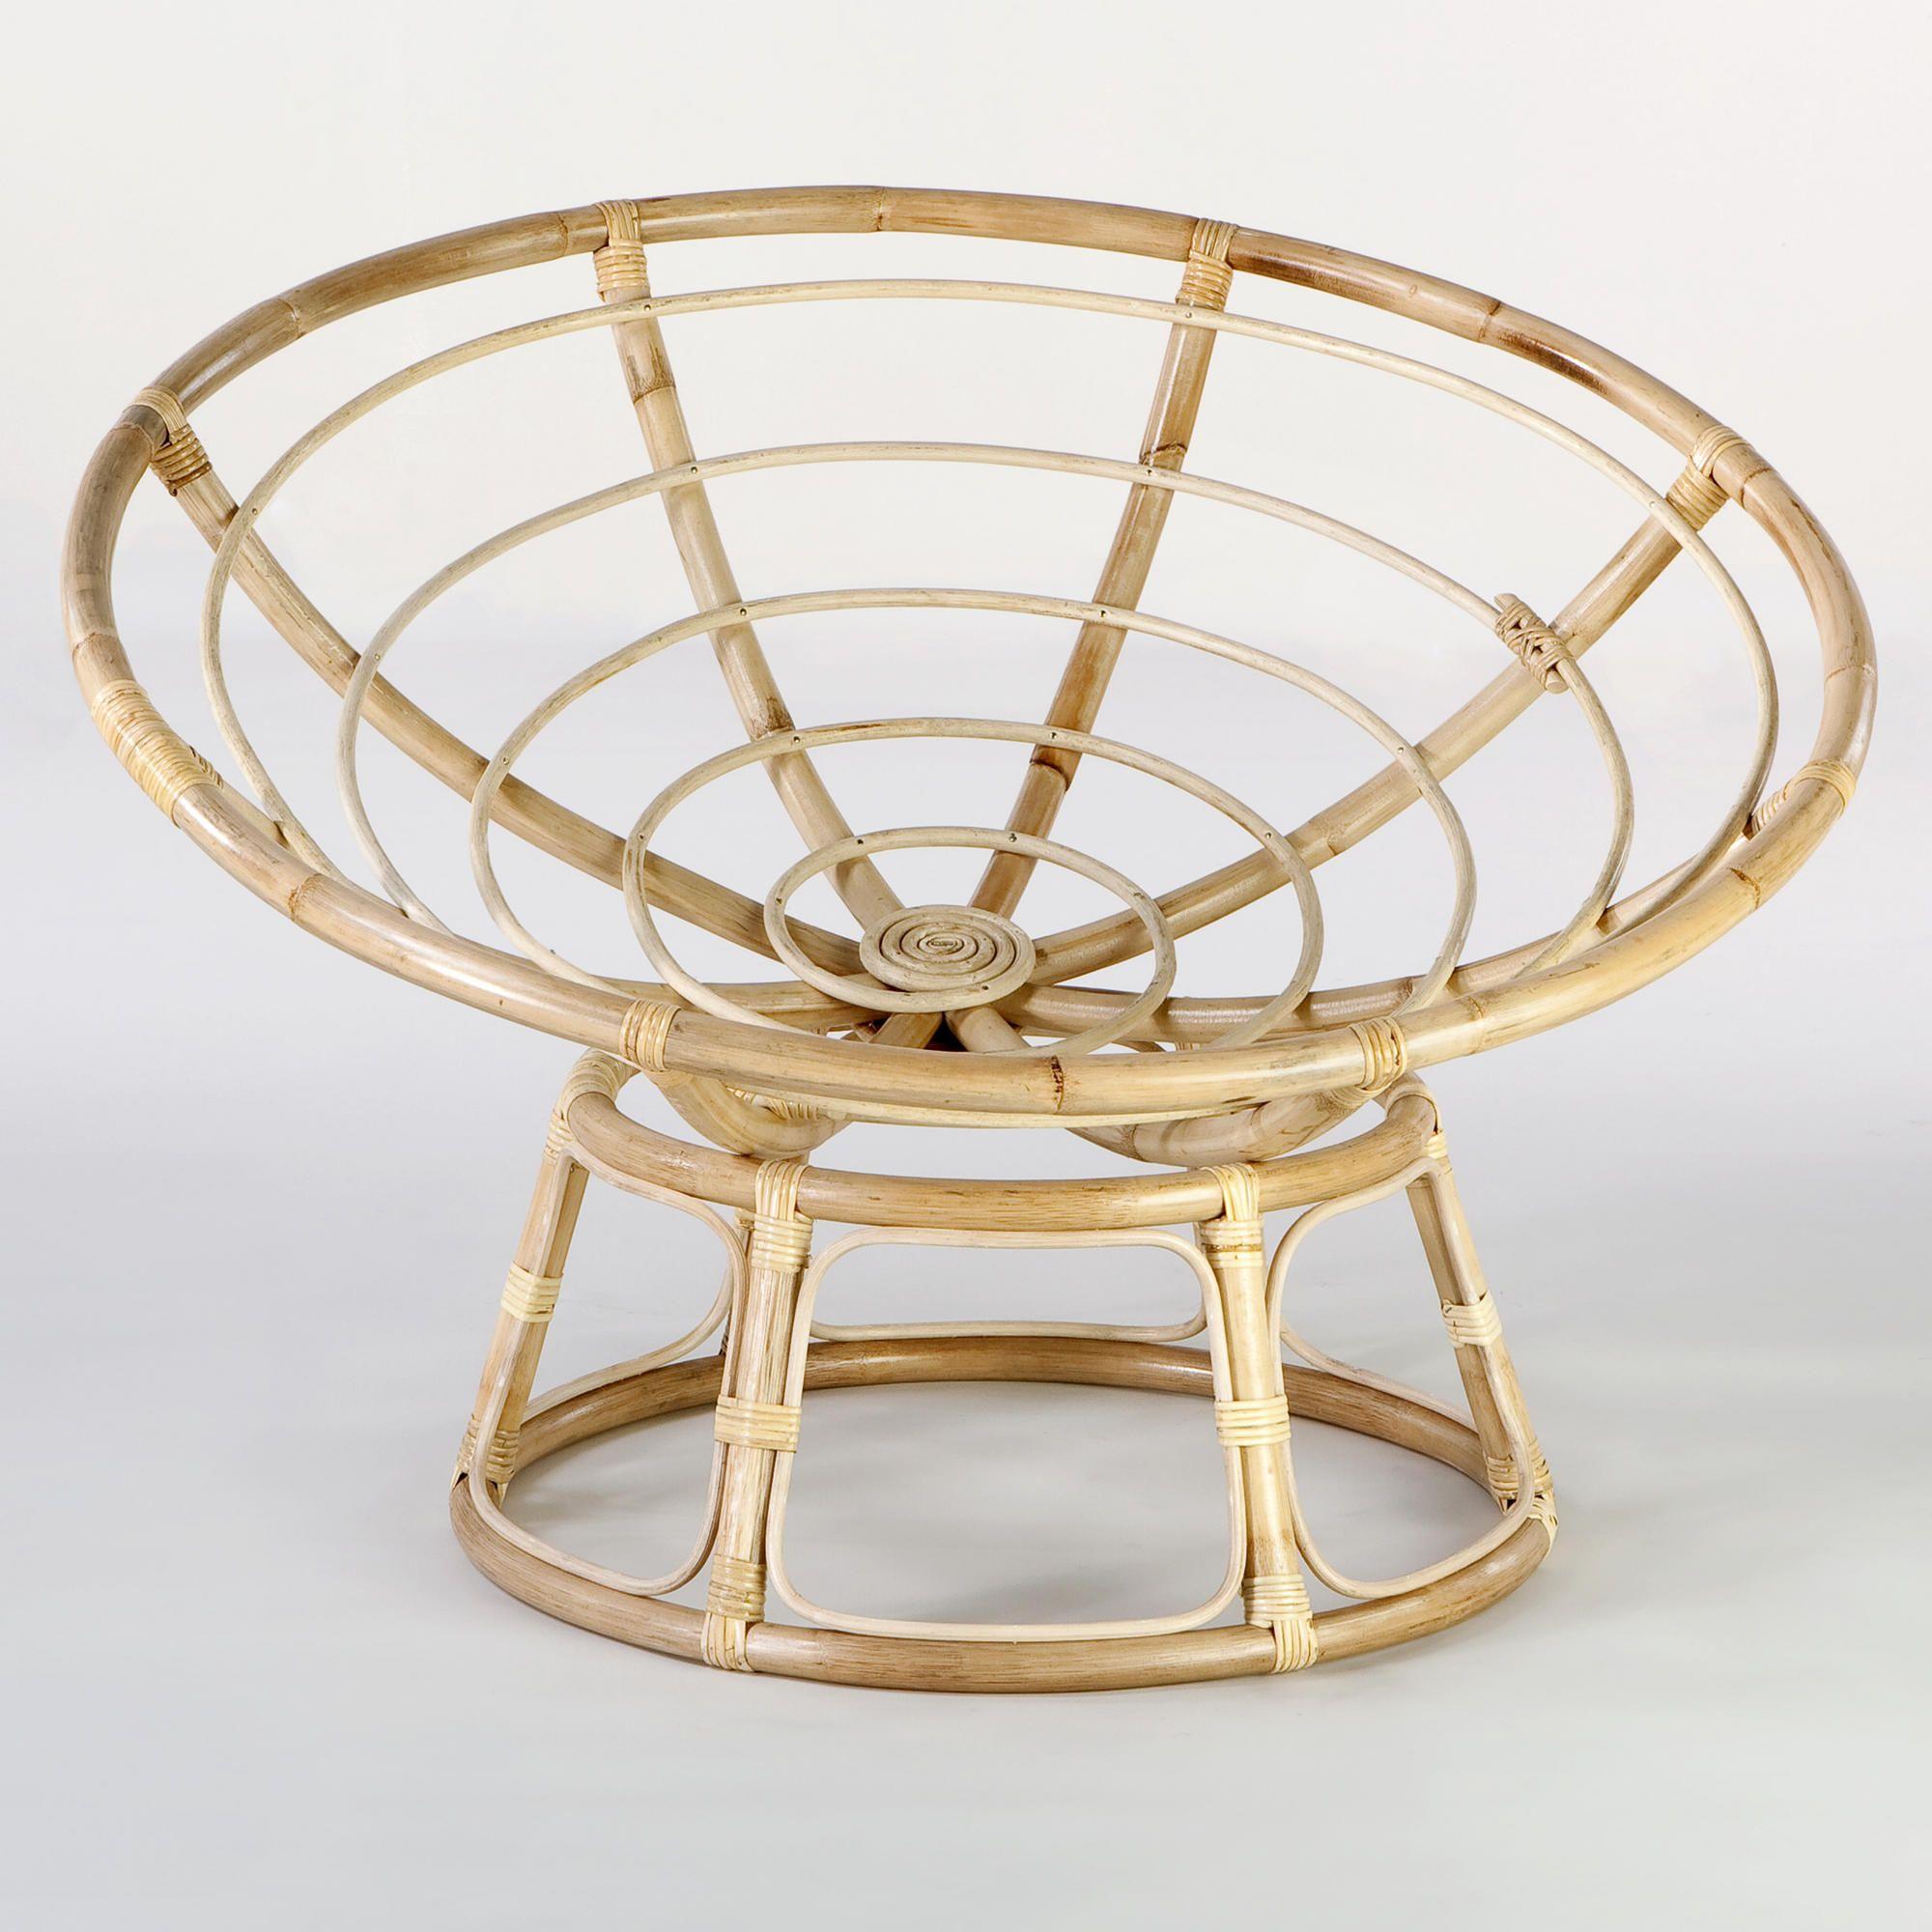 Natural Papasan Chair Frame World Market Papasan Chair Papasan Chair Frame Natural Chair